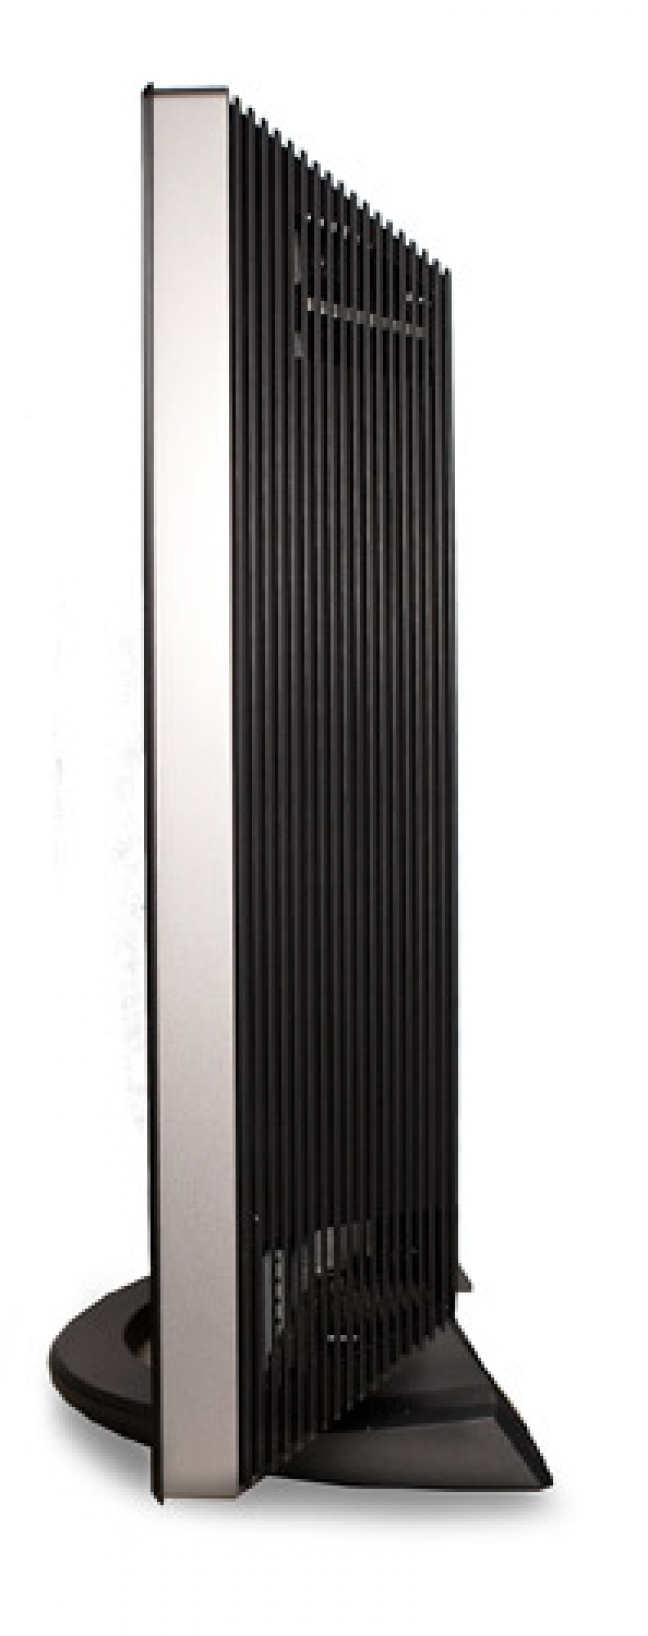 244352-bose-videowave-profile